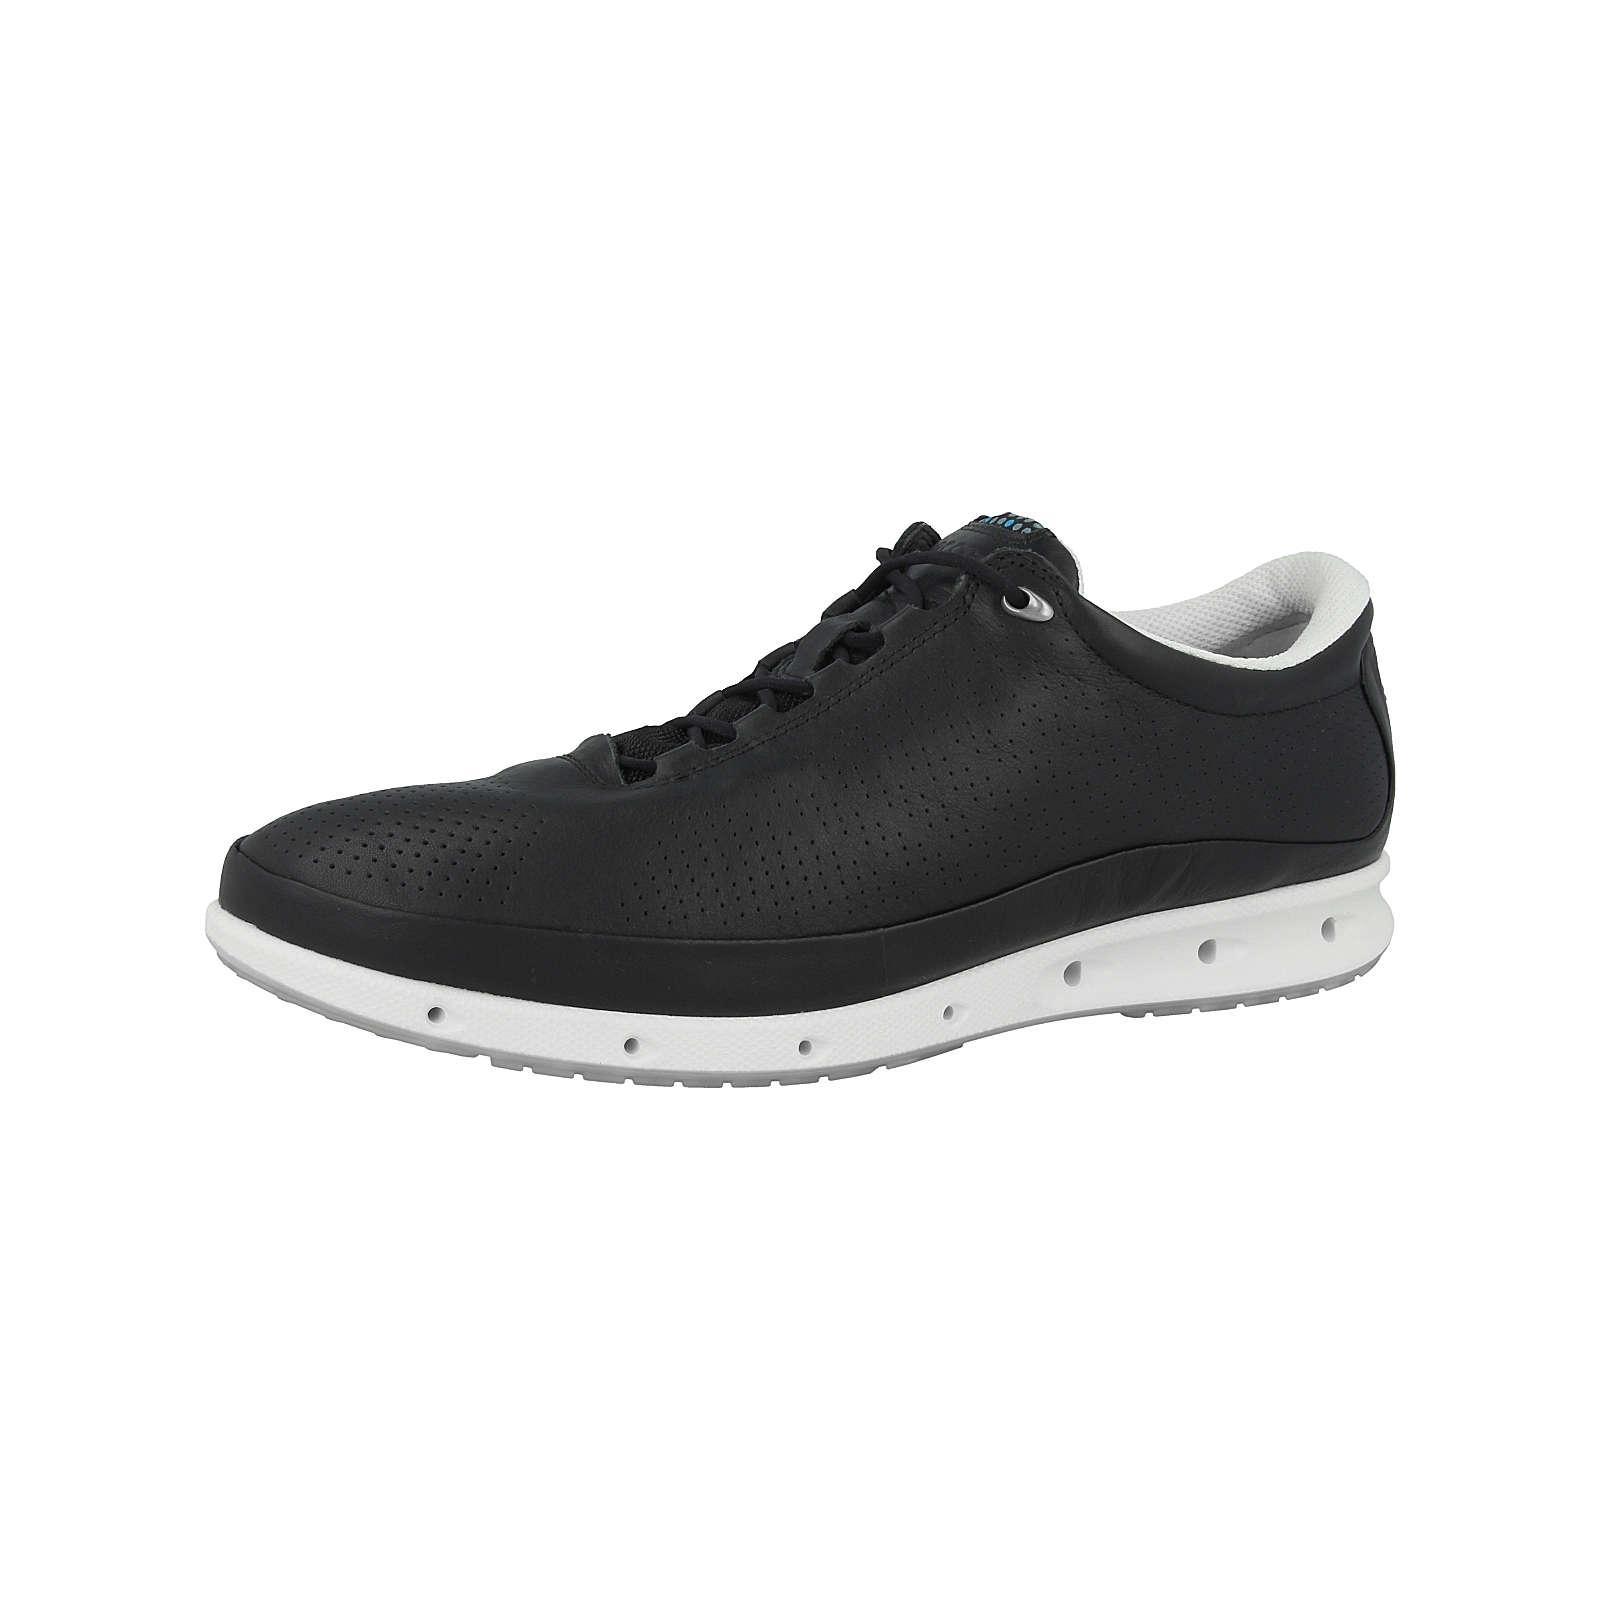 ecco Schuhe Cool Exhale GTX Surround Ladies Sneakers Low schwarz Damen Gr. 38